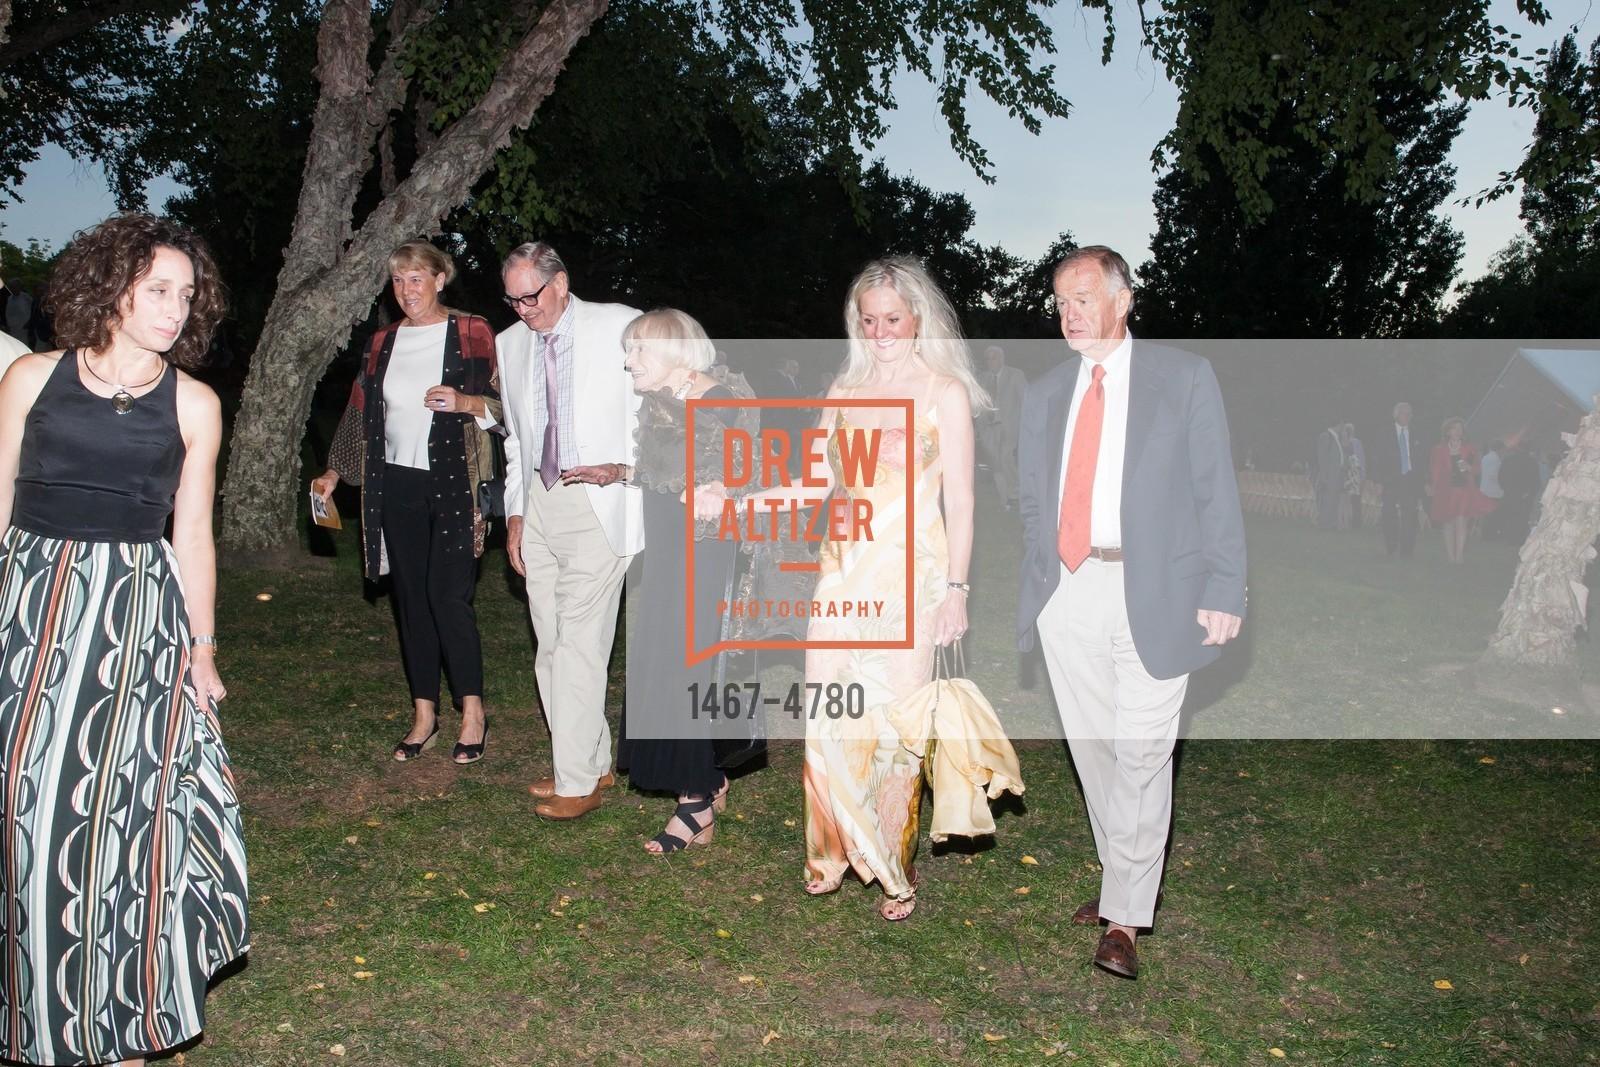 Jim Evans, Margrit Mondavi, Beth Nickel, Photo #1467-4780